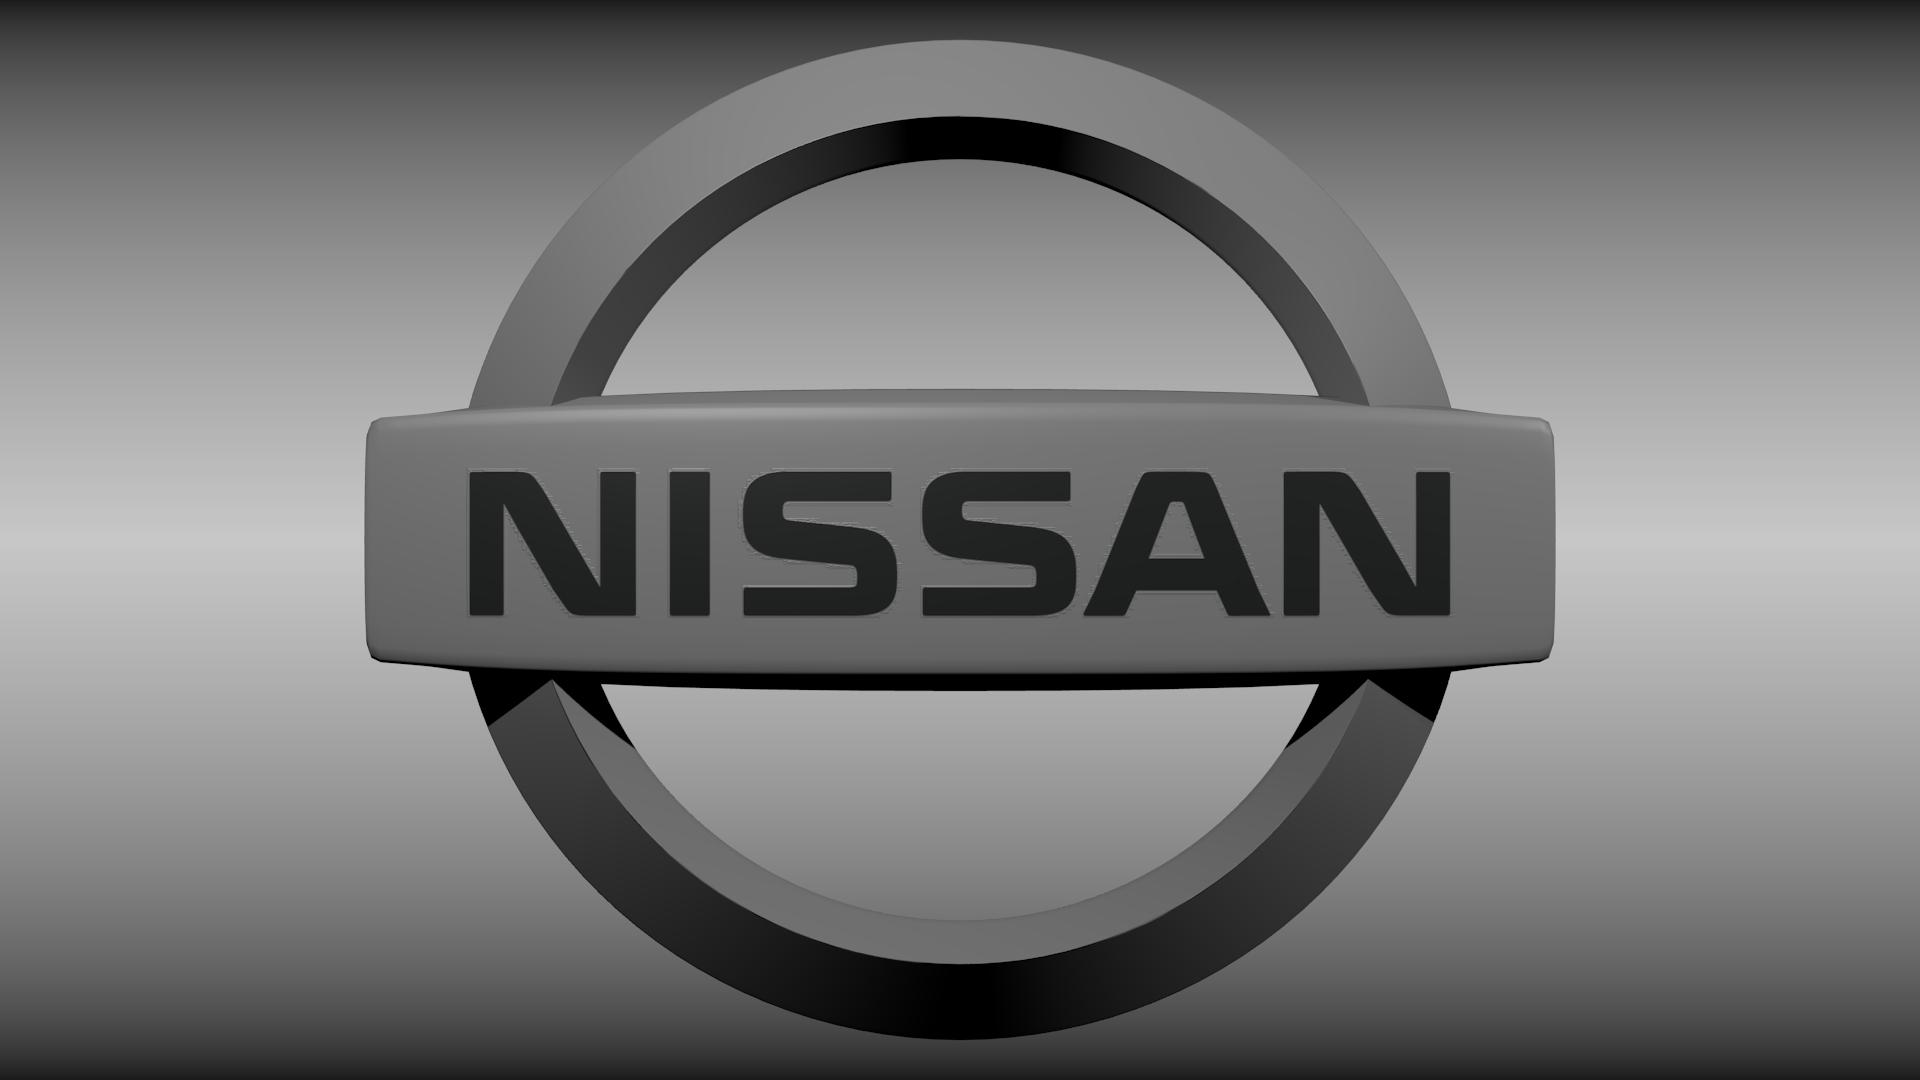 nissan logo png. nissan logo wallpaper 59073 png